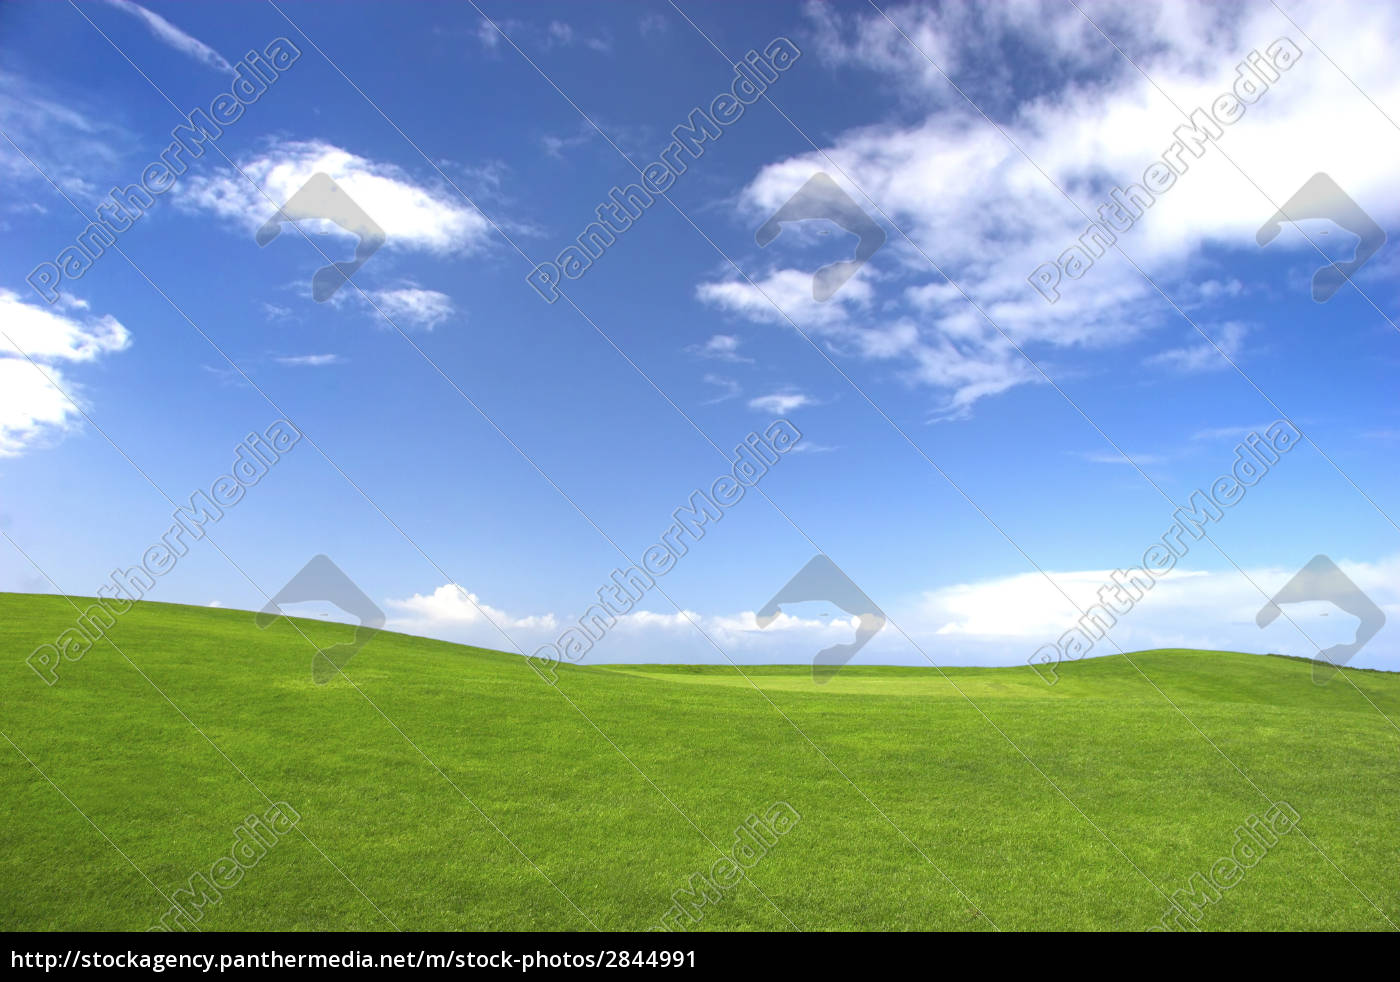 blue, horizon, park, agriculture, farming, shine - 2844991